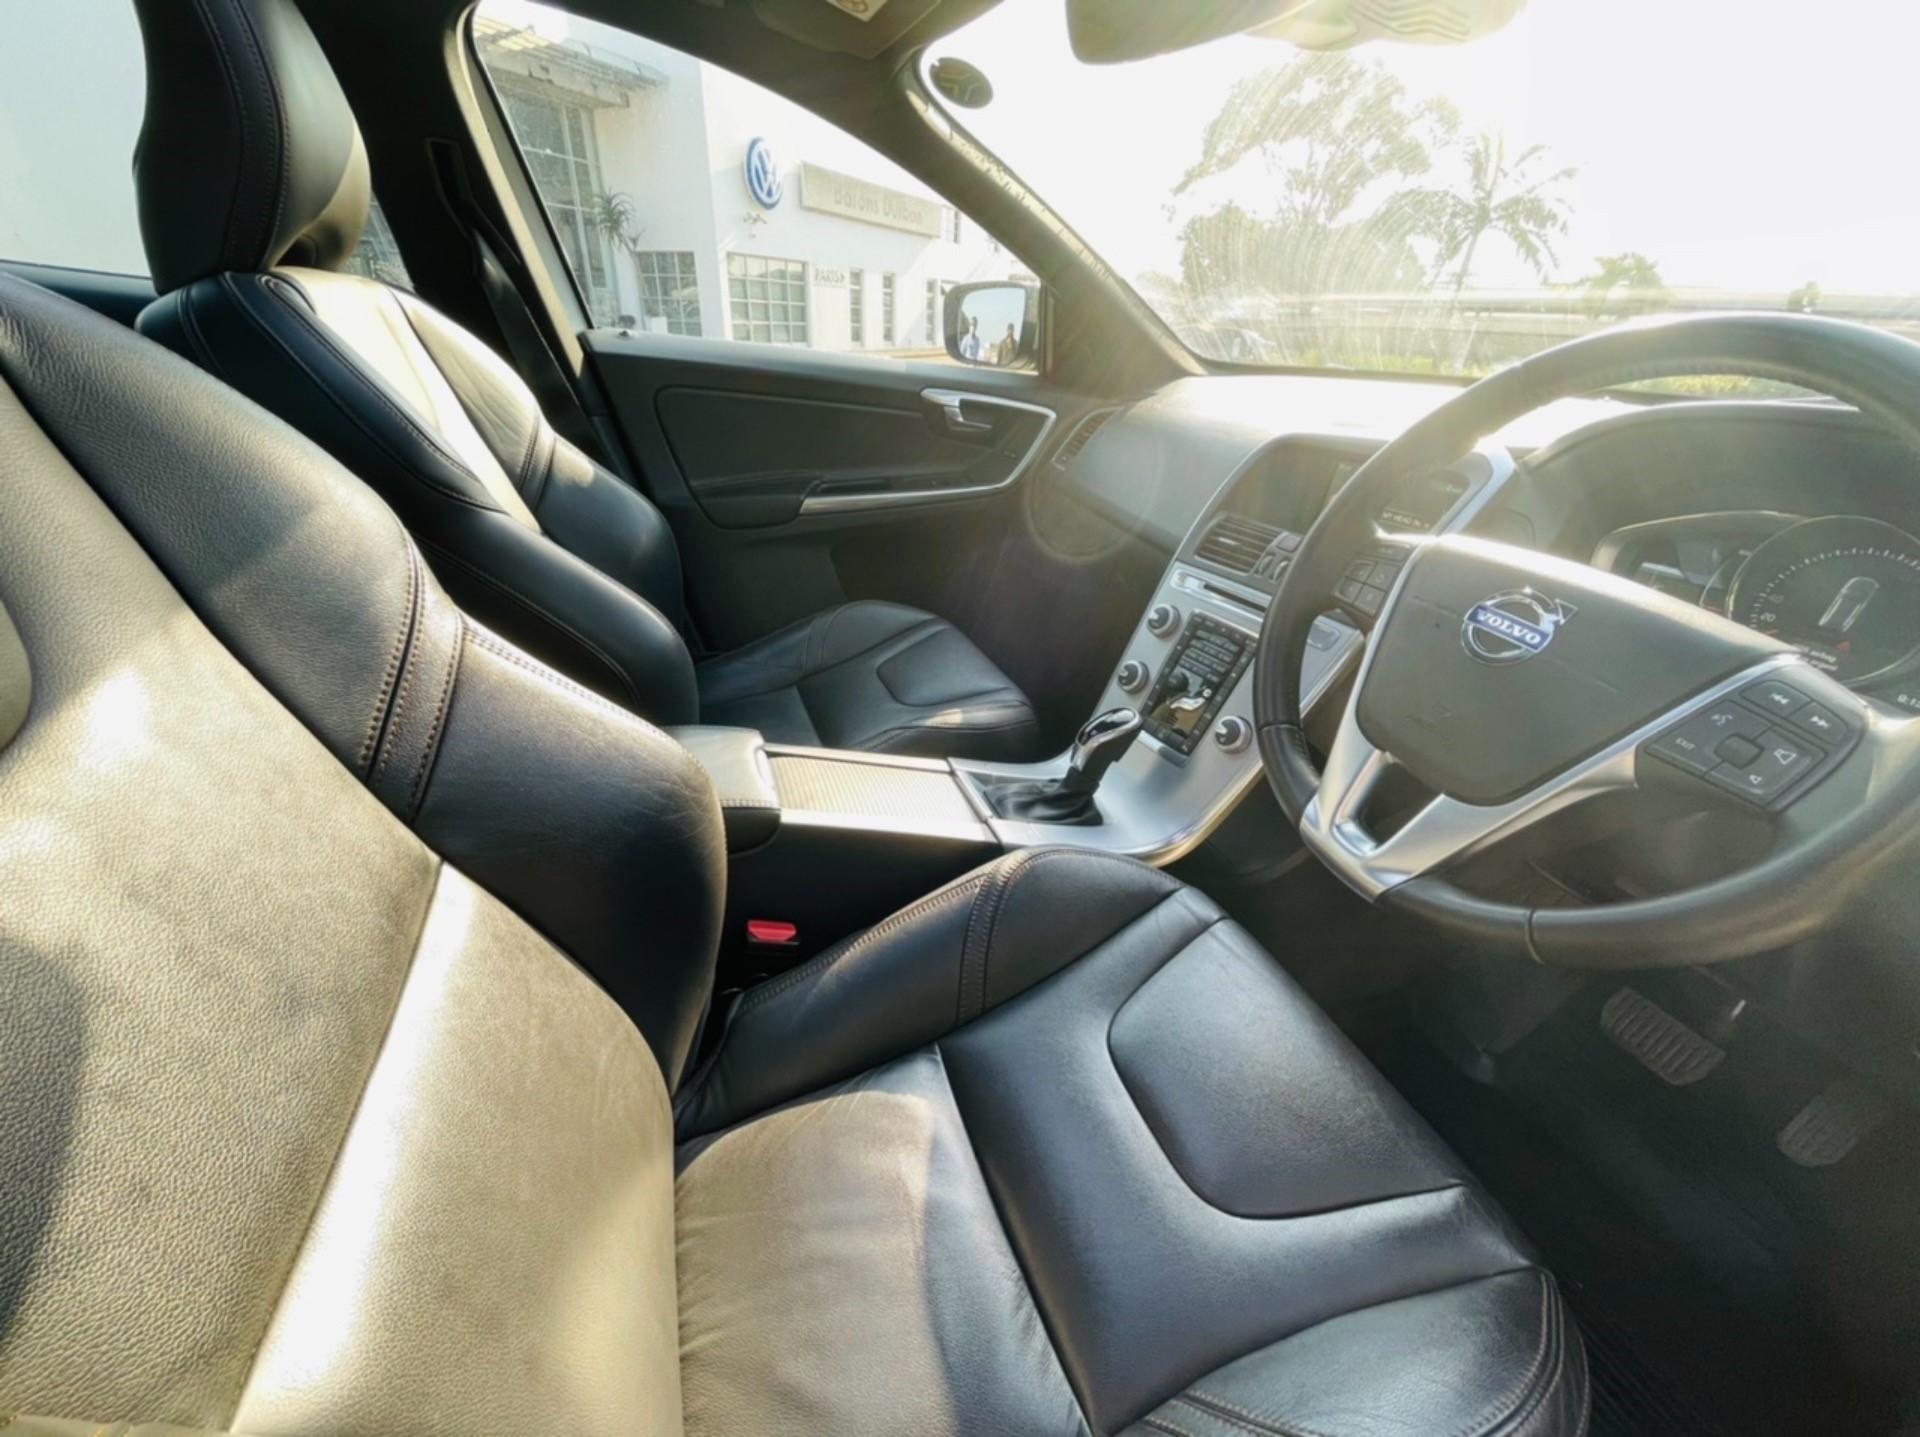 2017 VOLVO XC60 D4 INSCRIPTION GEARTRONIC (DRIVE -E)